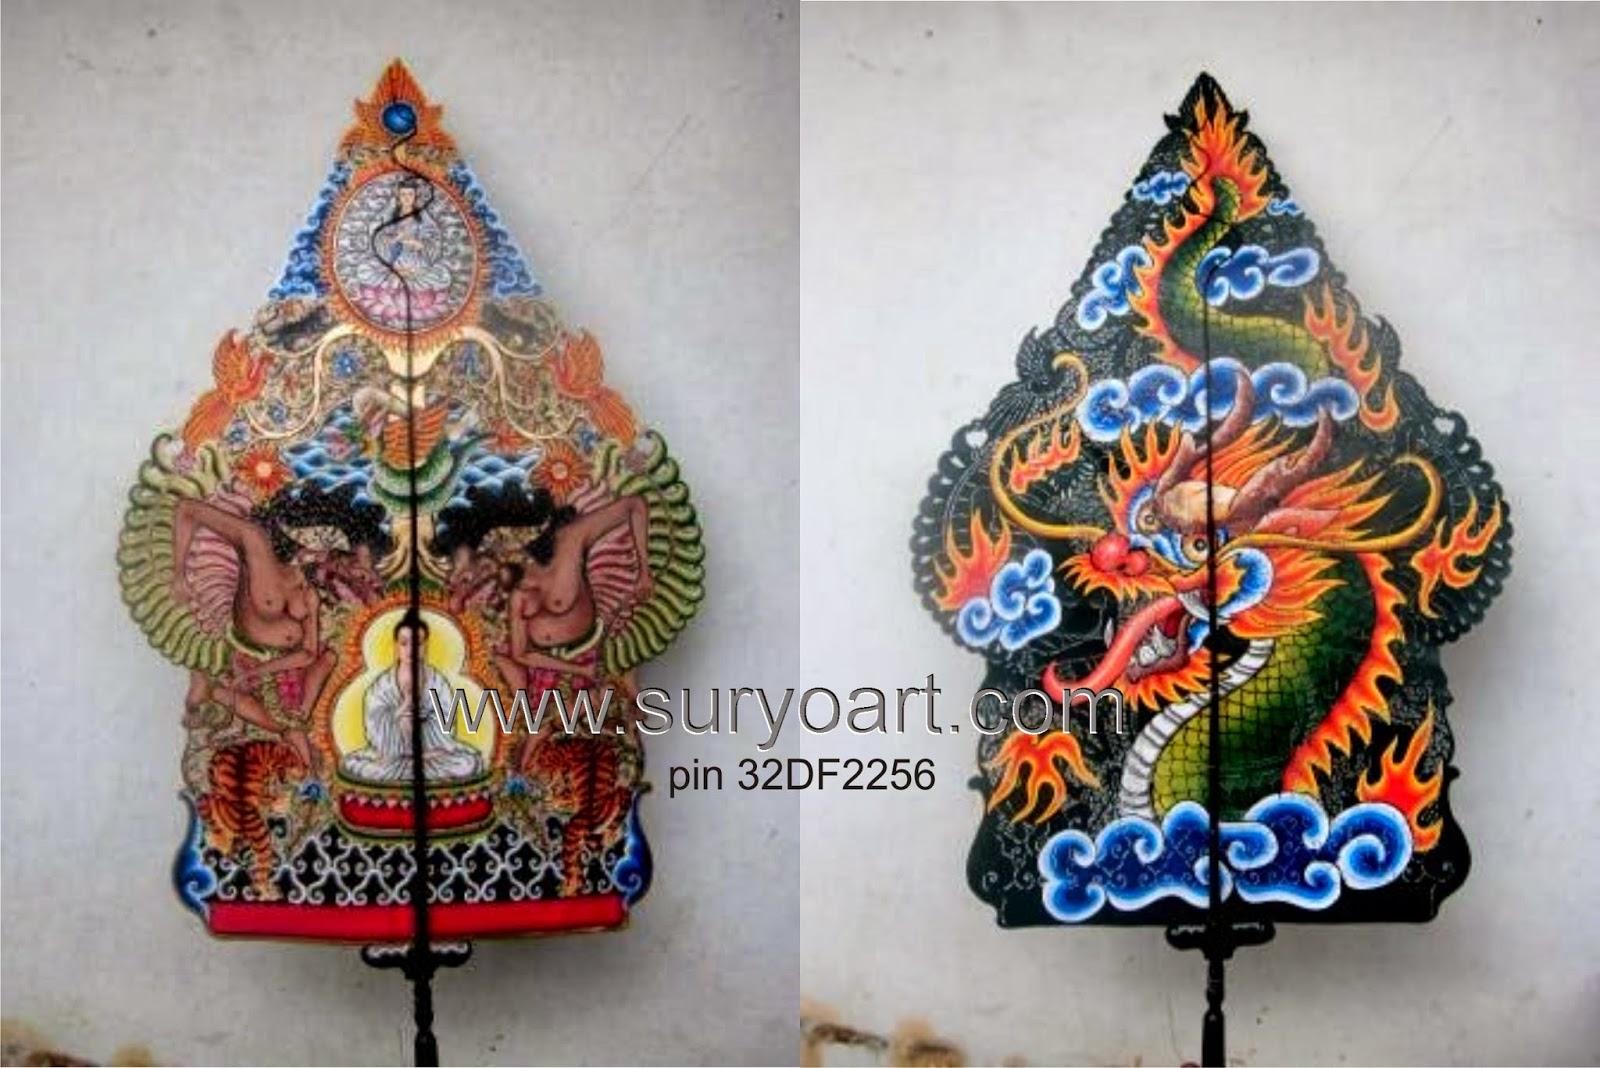 SURYOART Craft: Penjual Wayang Kulit Kwalitas Pentas ...